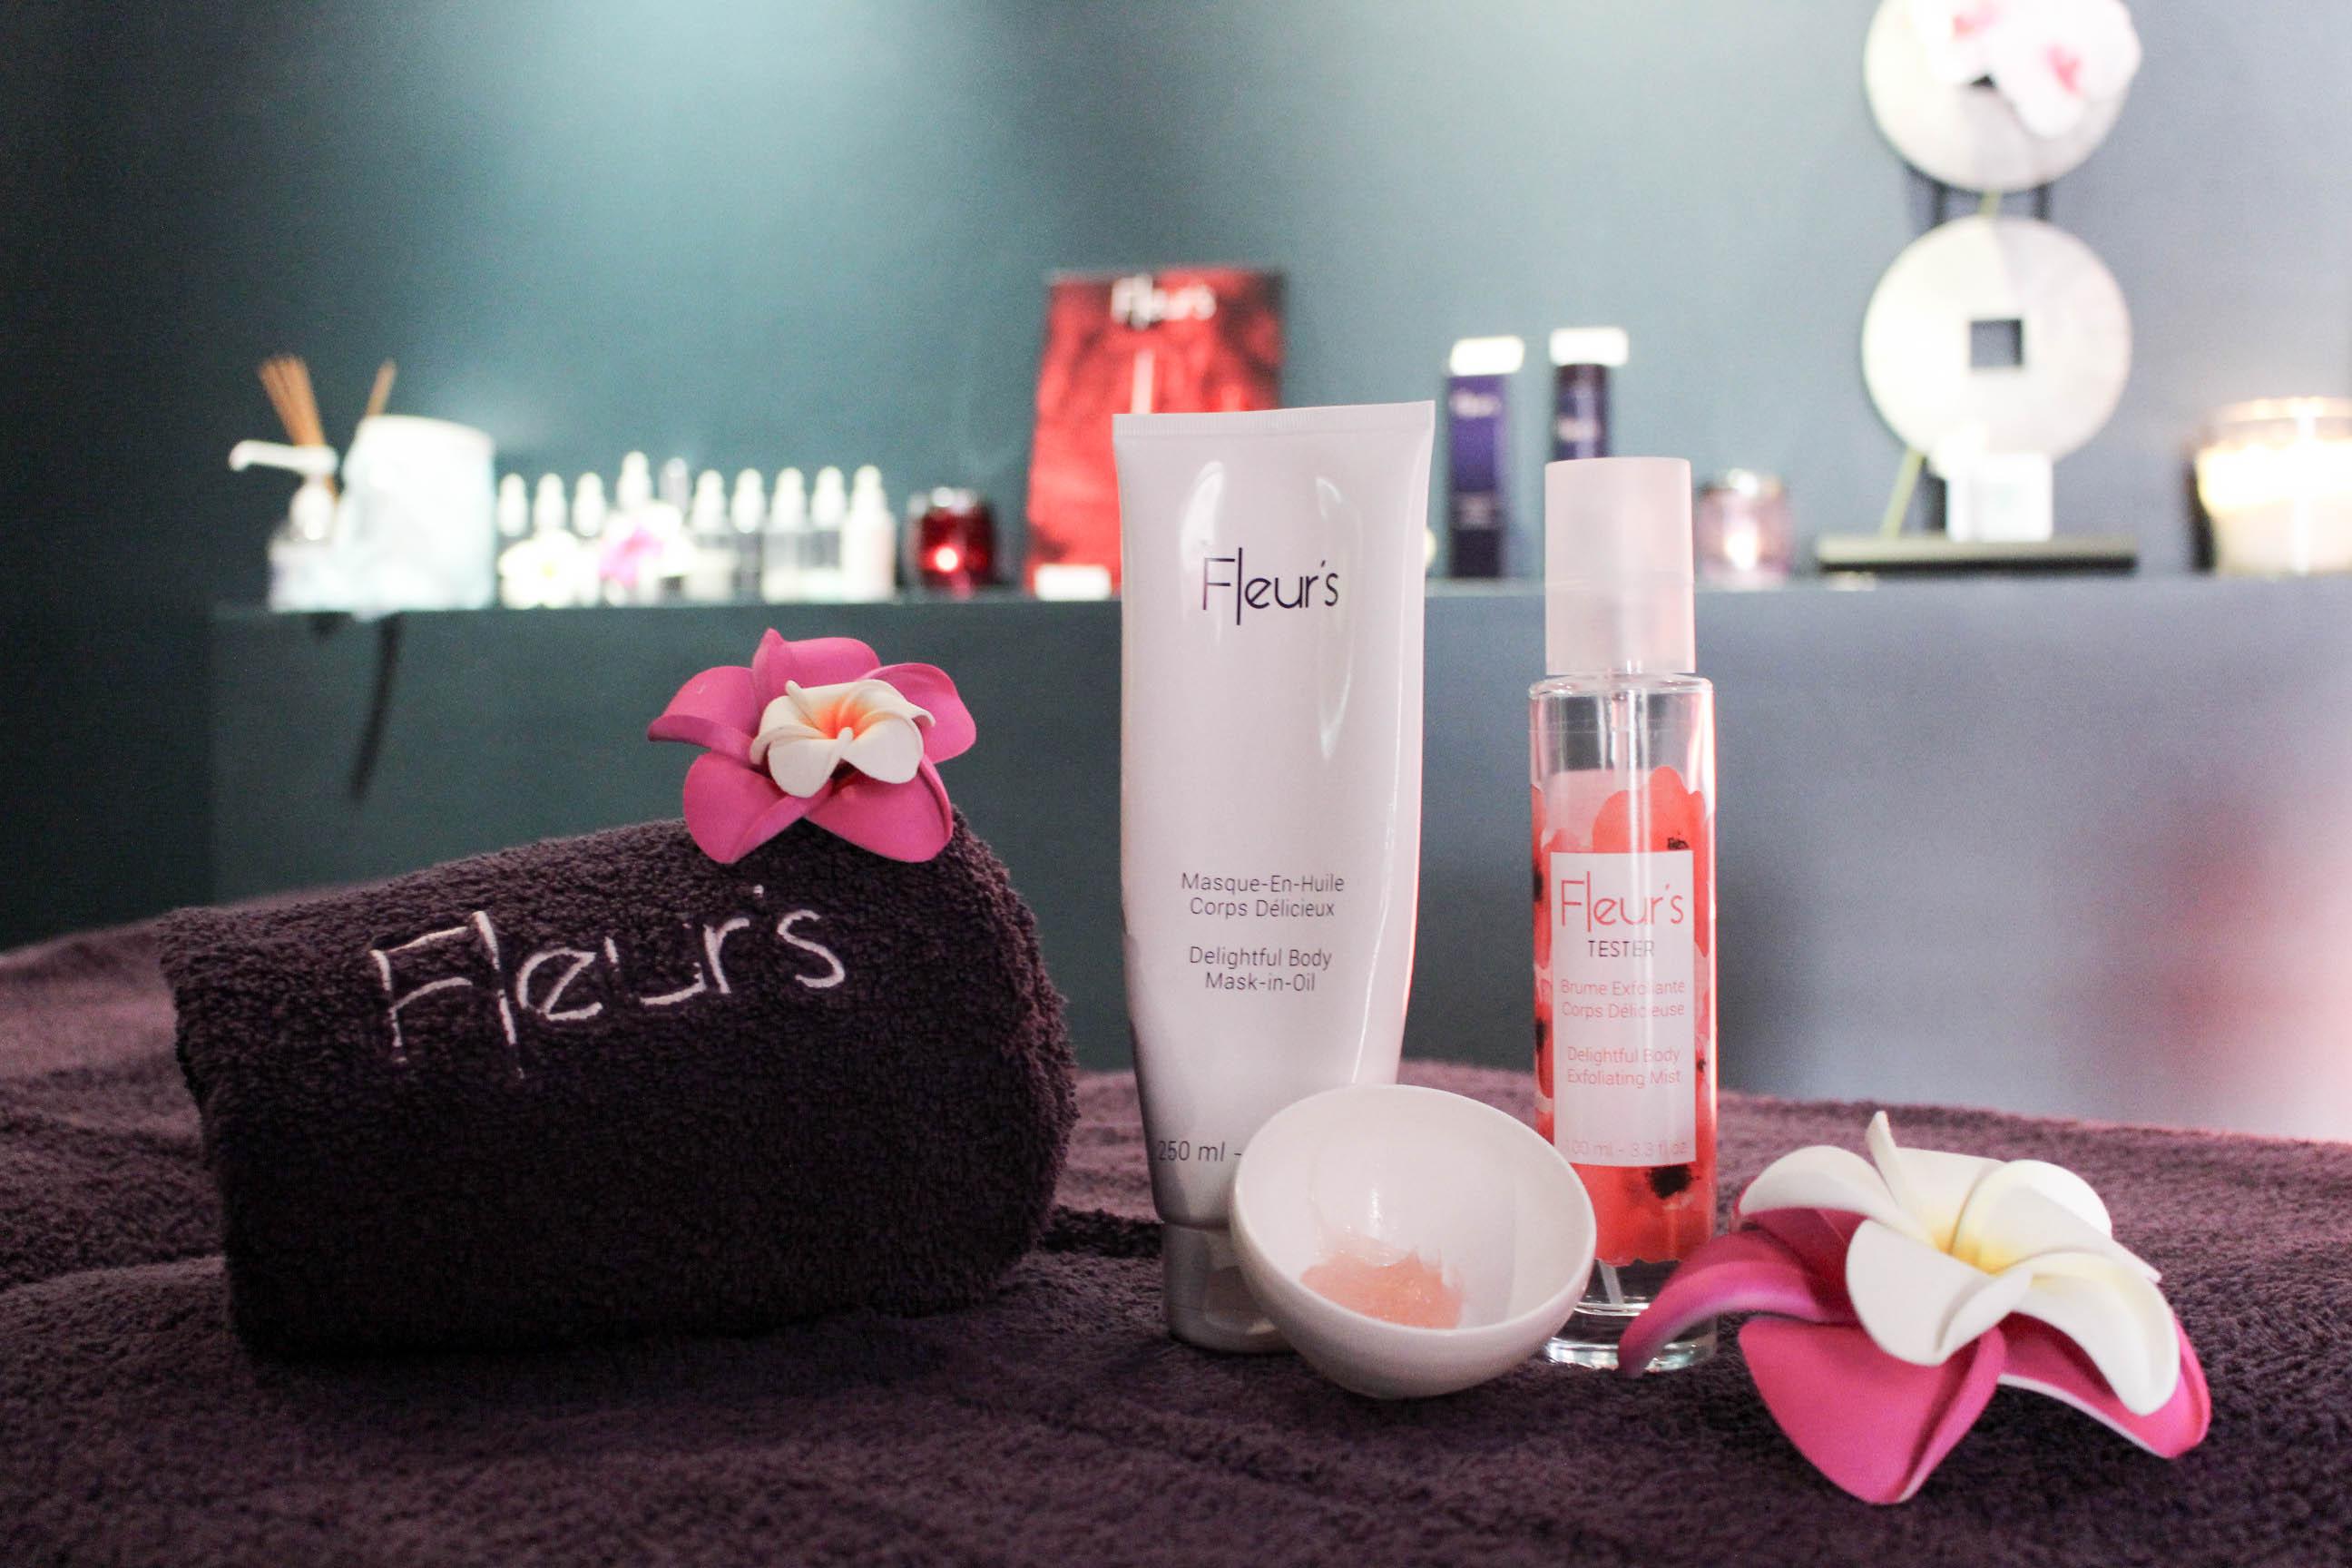 fleurs de soin castries institut massage produits fleurs rituel avis mademoiselle e